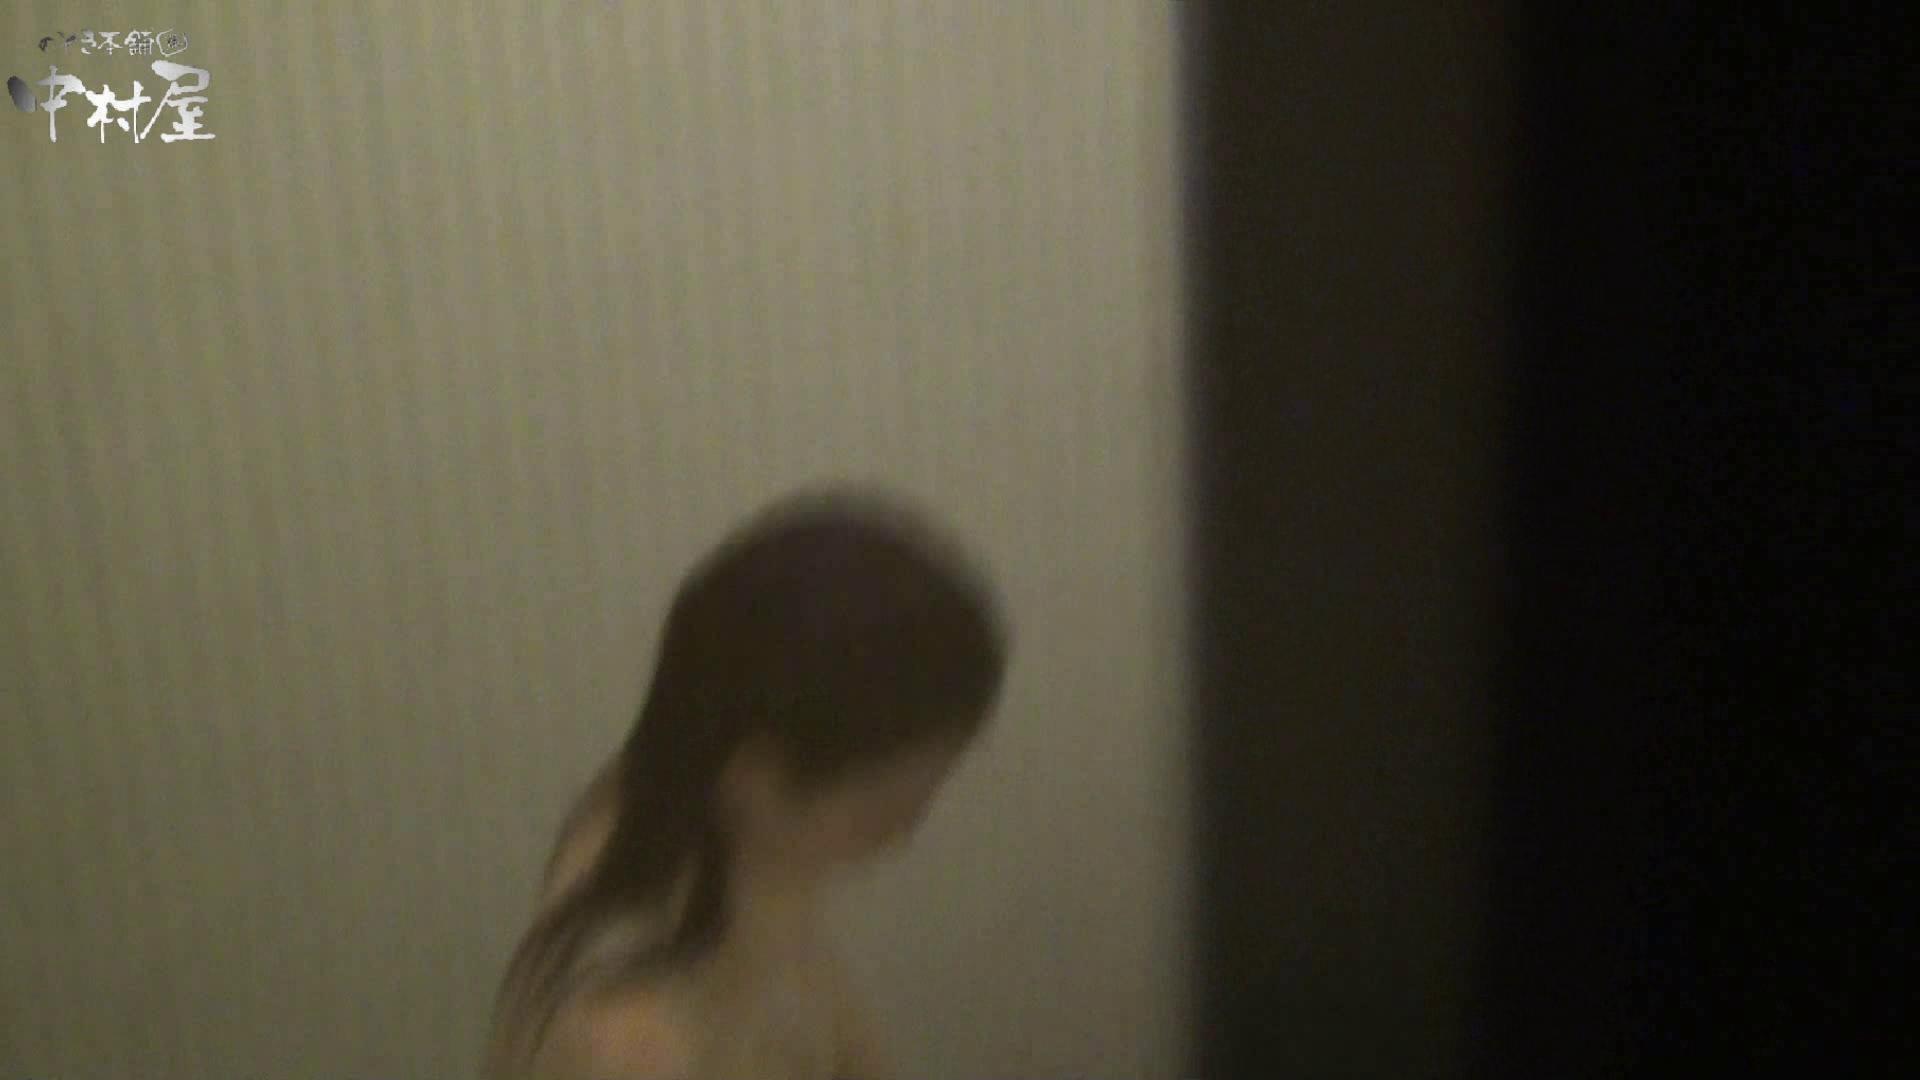 民家風呂専門盗撮師の超危険映像 vol.029 股間 | OLのエロ生活  26連発 13